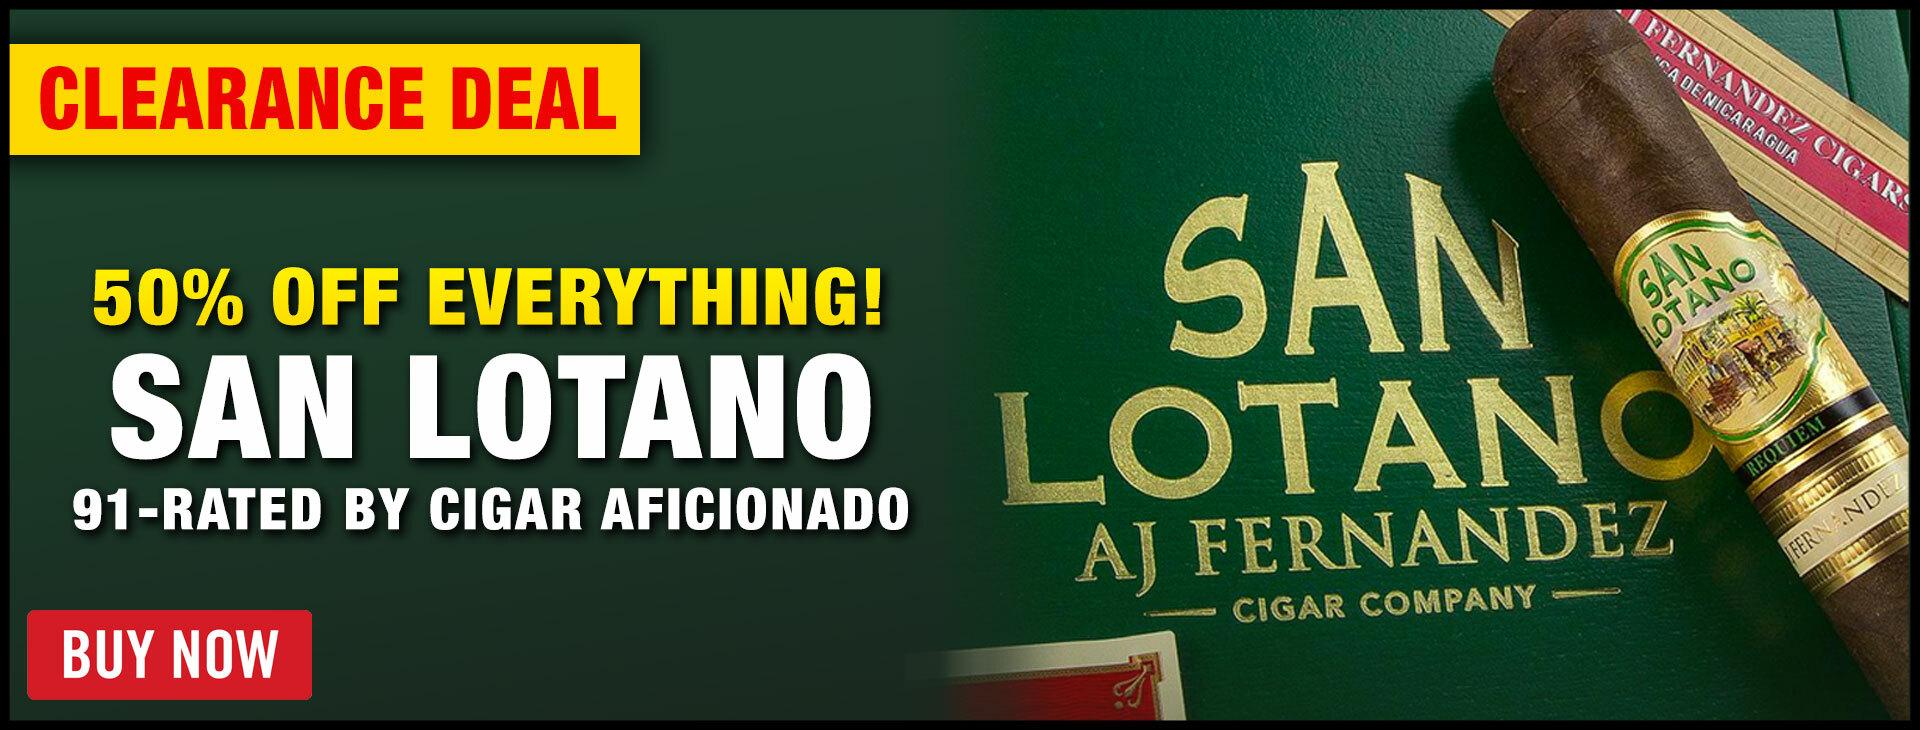 50% OFF EVERYTHING: AJ FERNANDEZ SAN LOTANO